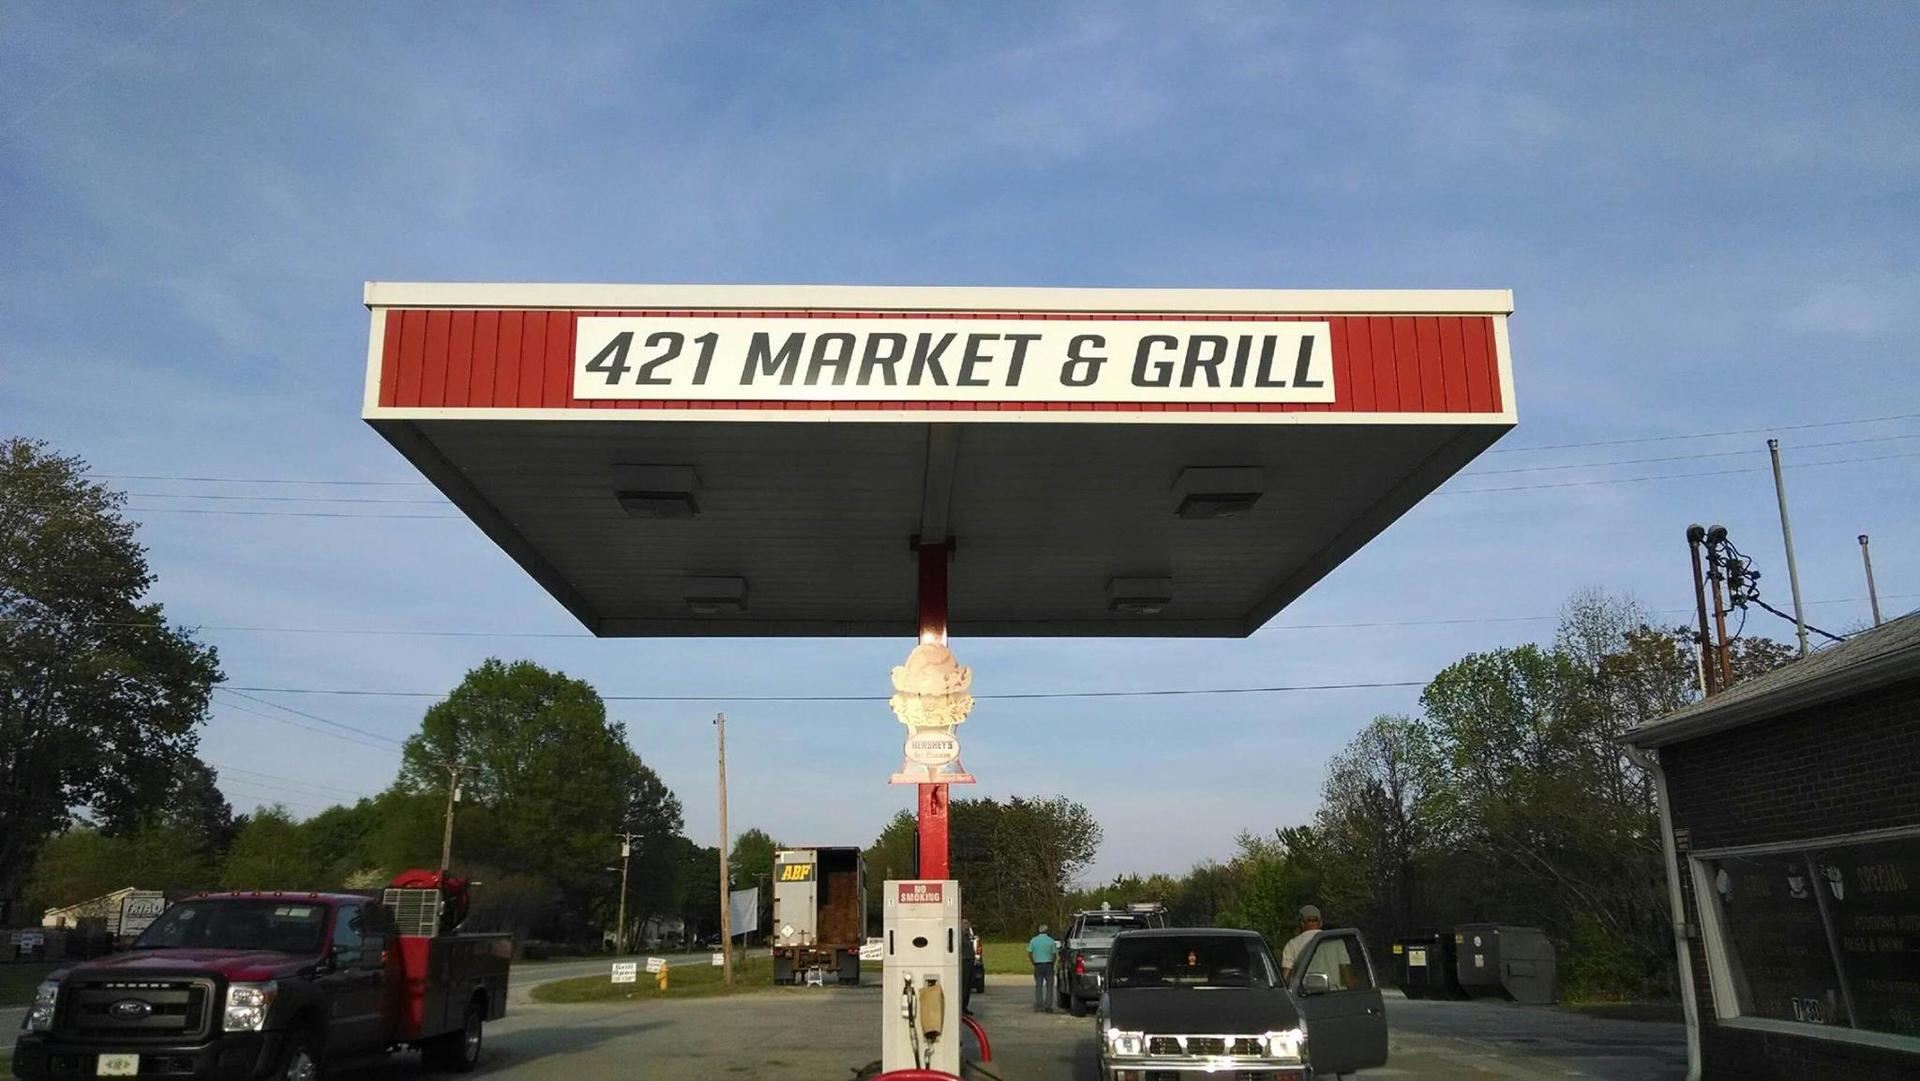 421 market & Grill